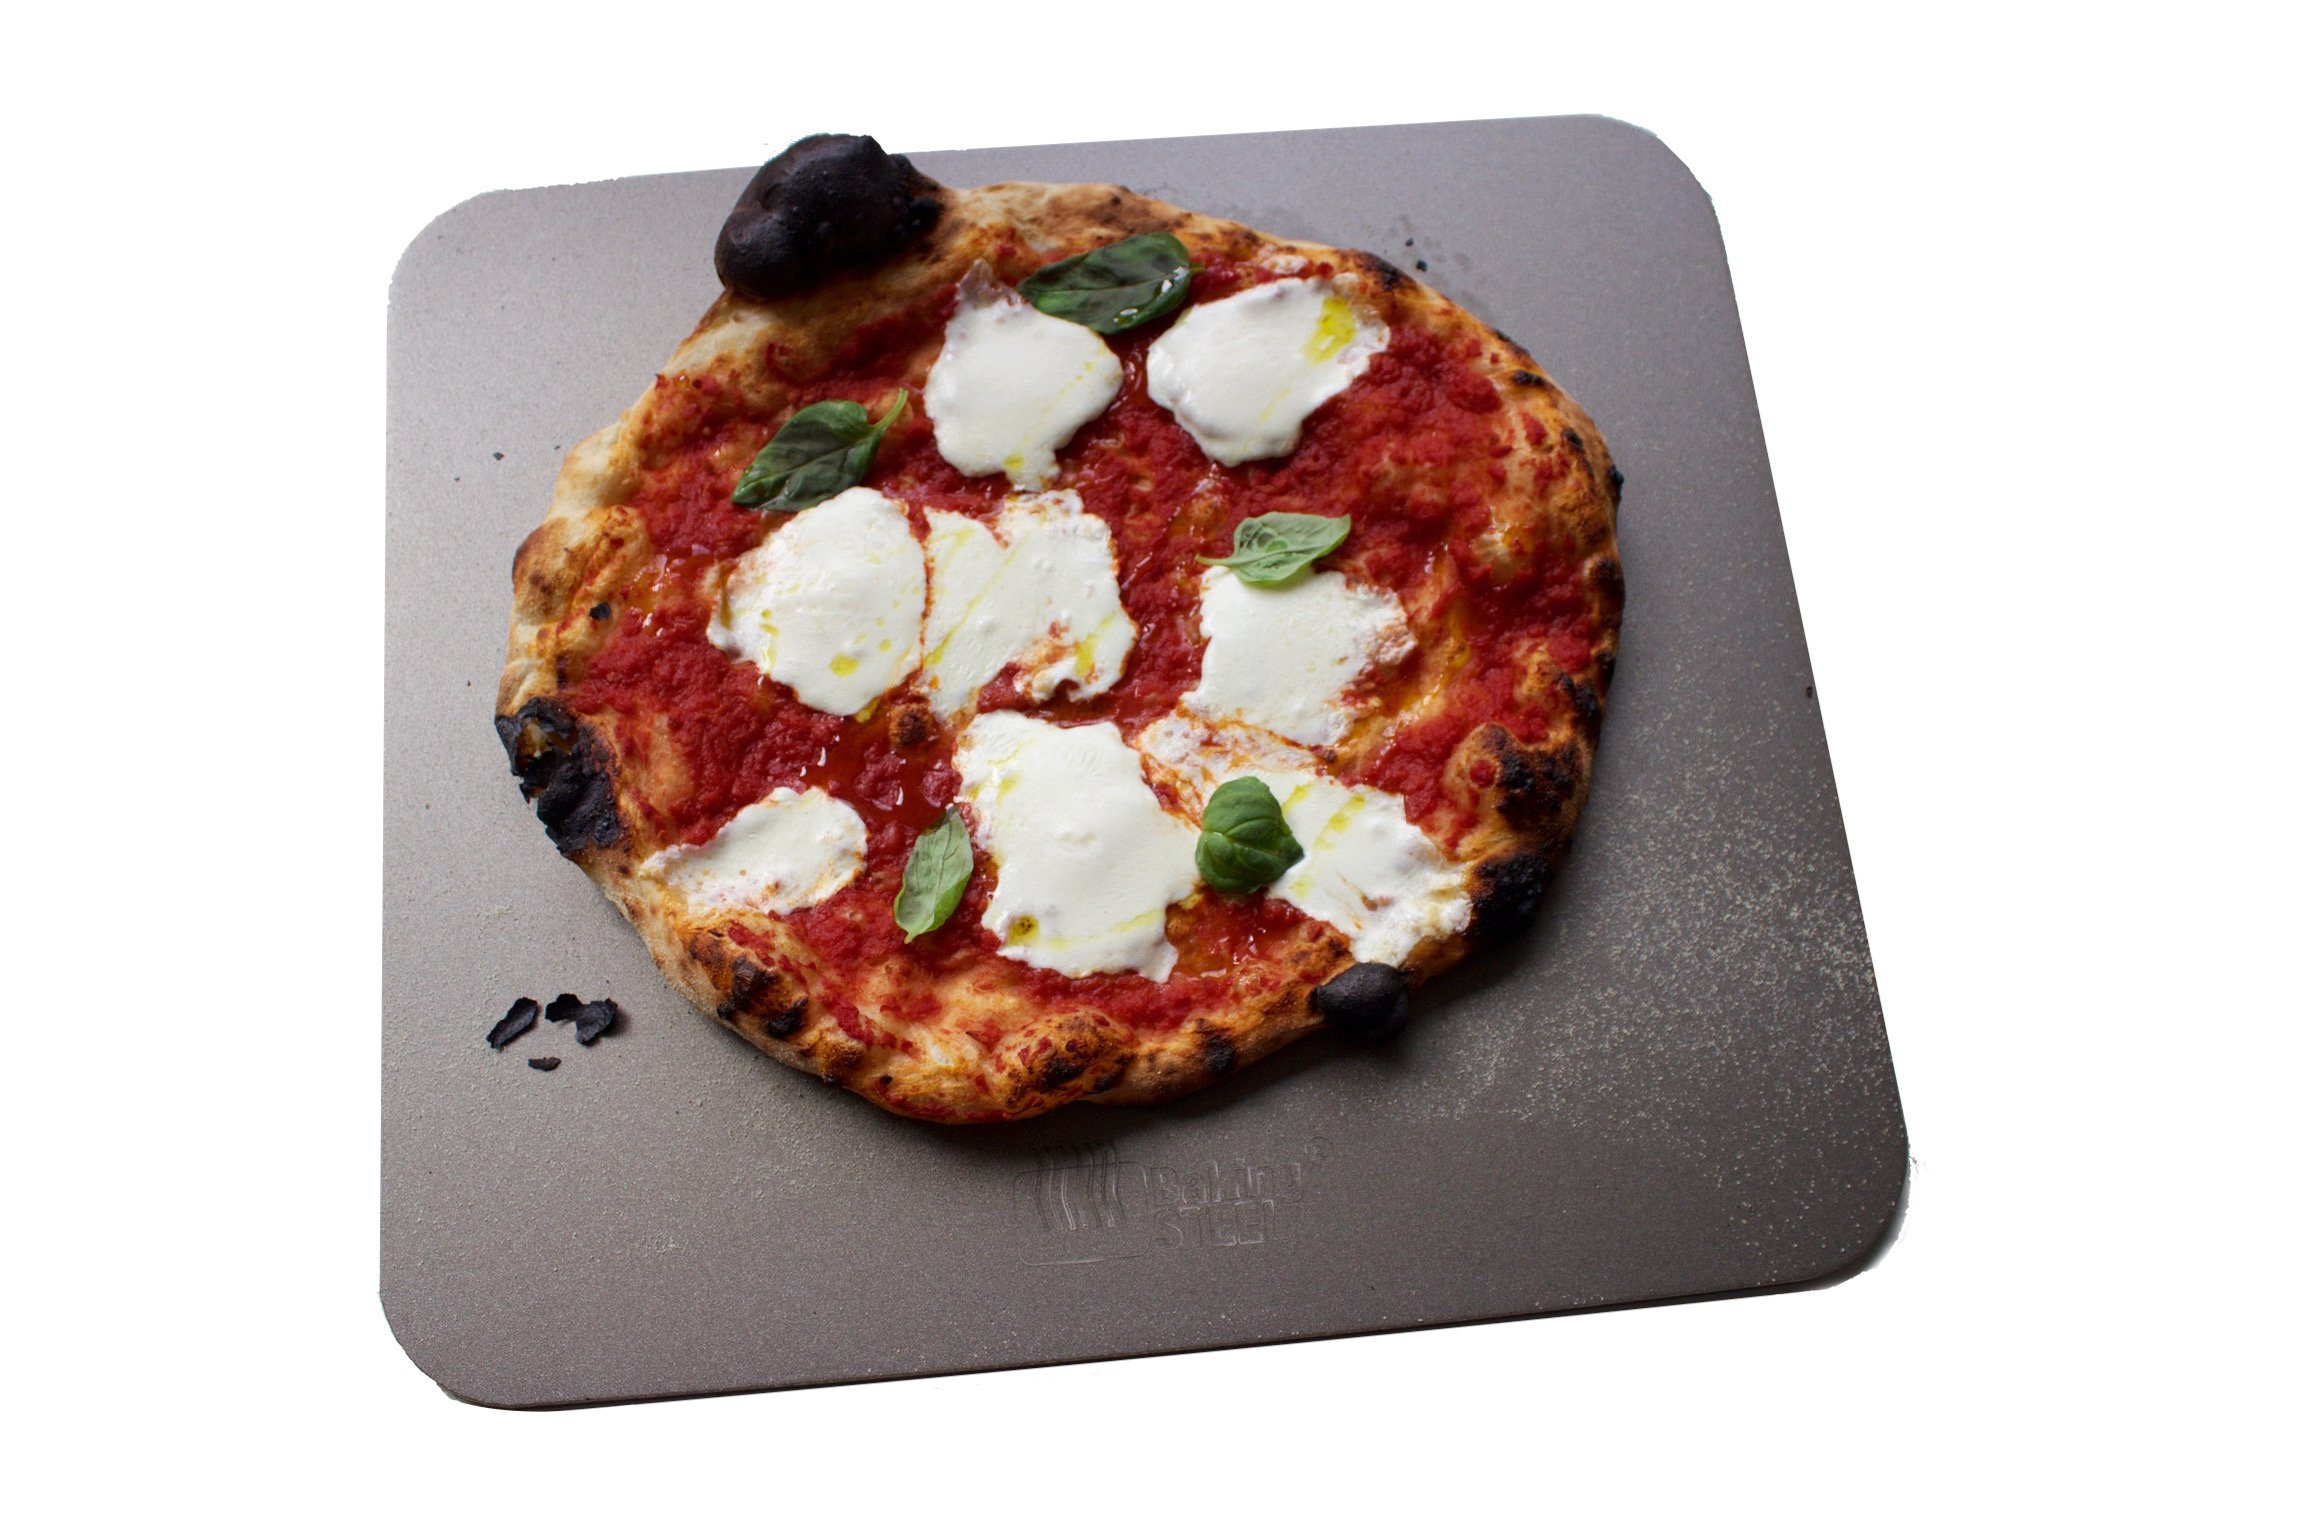 Baking Steel - The Original Ultra Conductive Pizza Stone (14''x16''x1/4'') by The Original Baking Steel